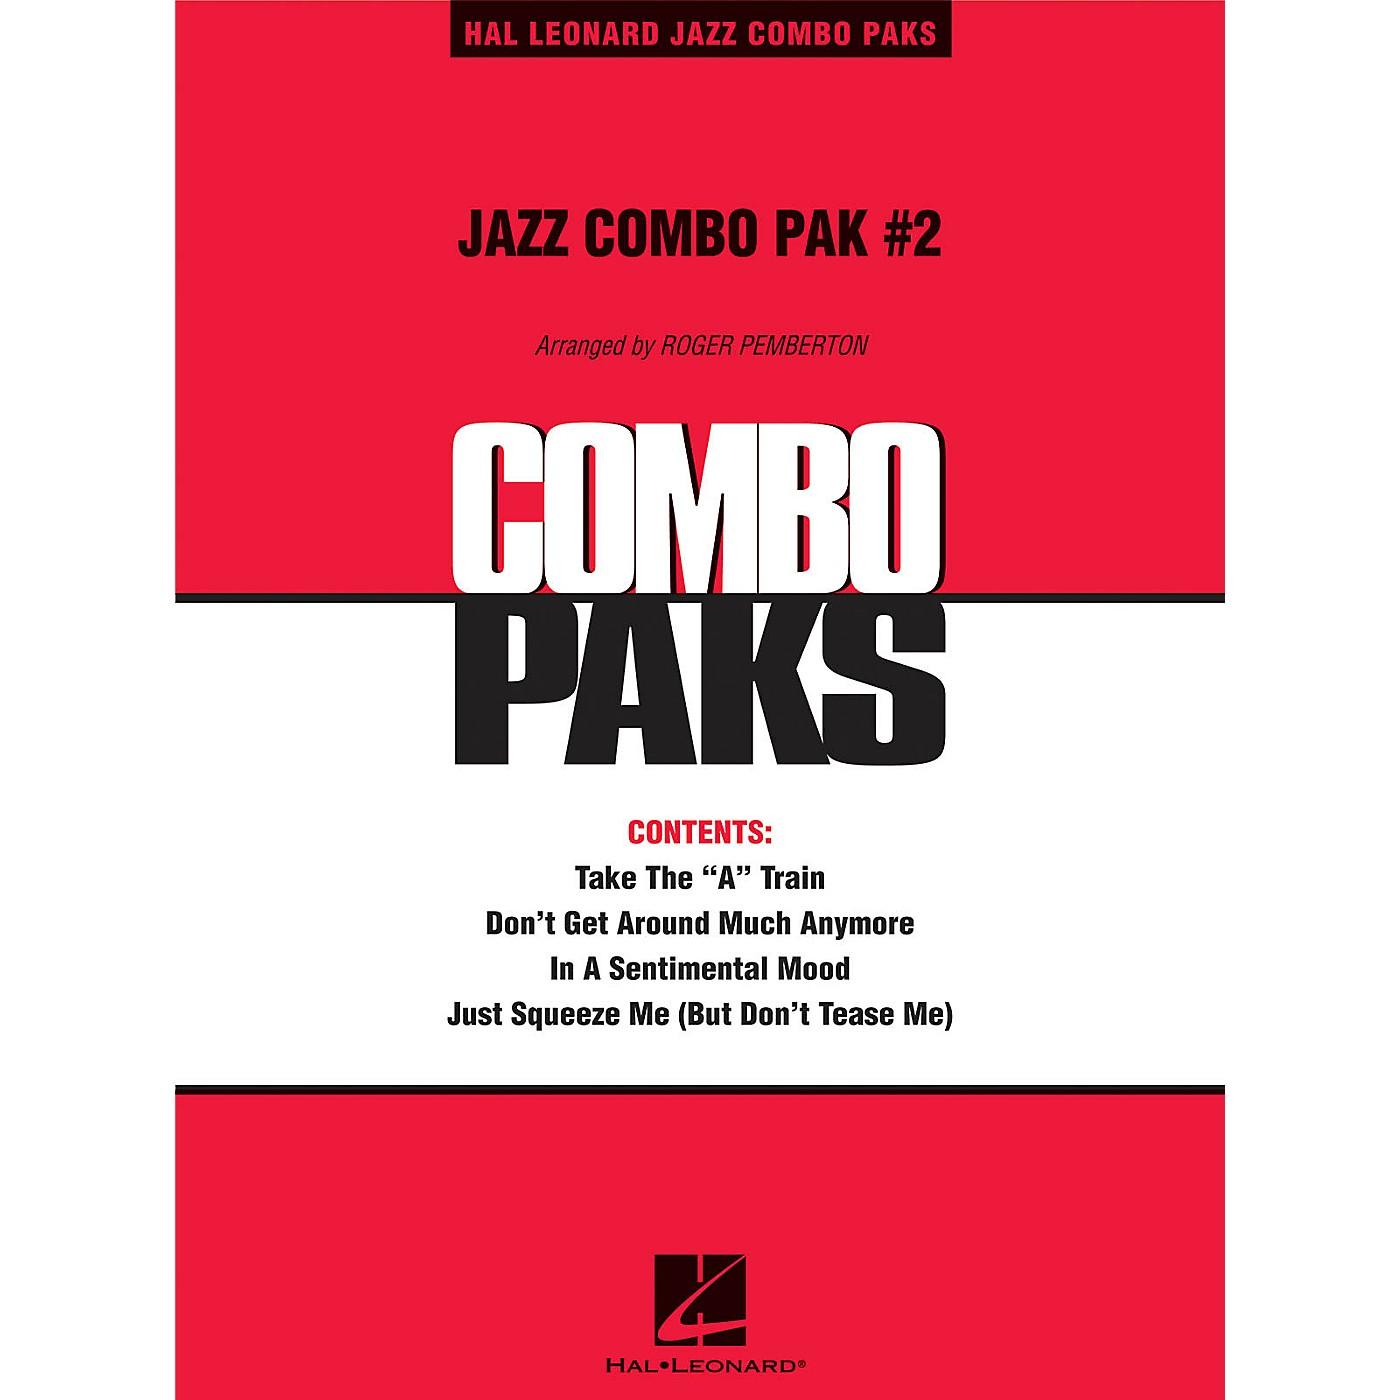 Hal Leonard Jazz Combo Pak #2 (with audio download) Jazz Band Level 3 Arranged by Roger Pemberton thumbnail